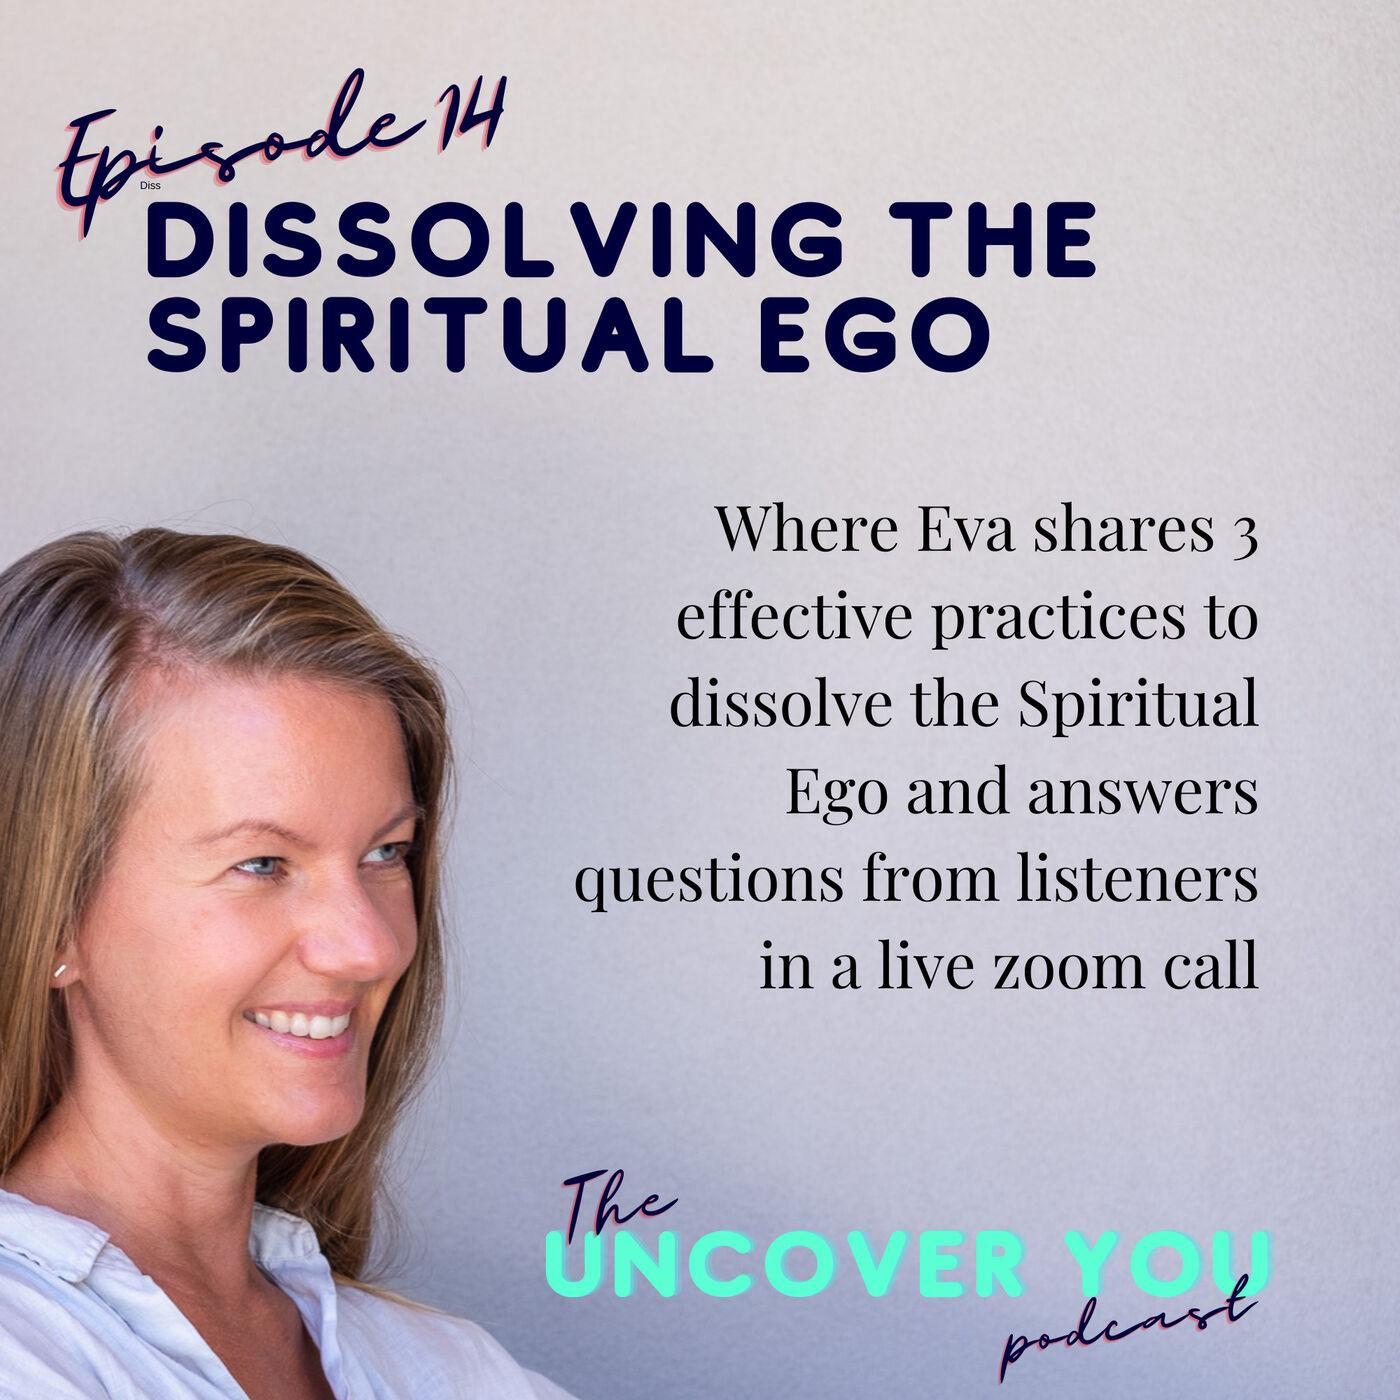 Ep 14: Dissolving the Spiritual Ego